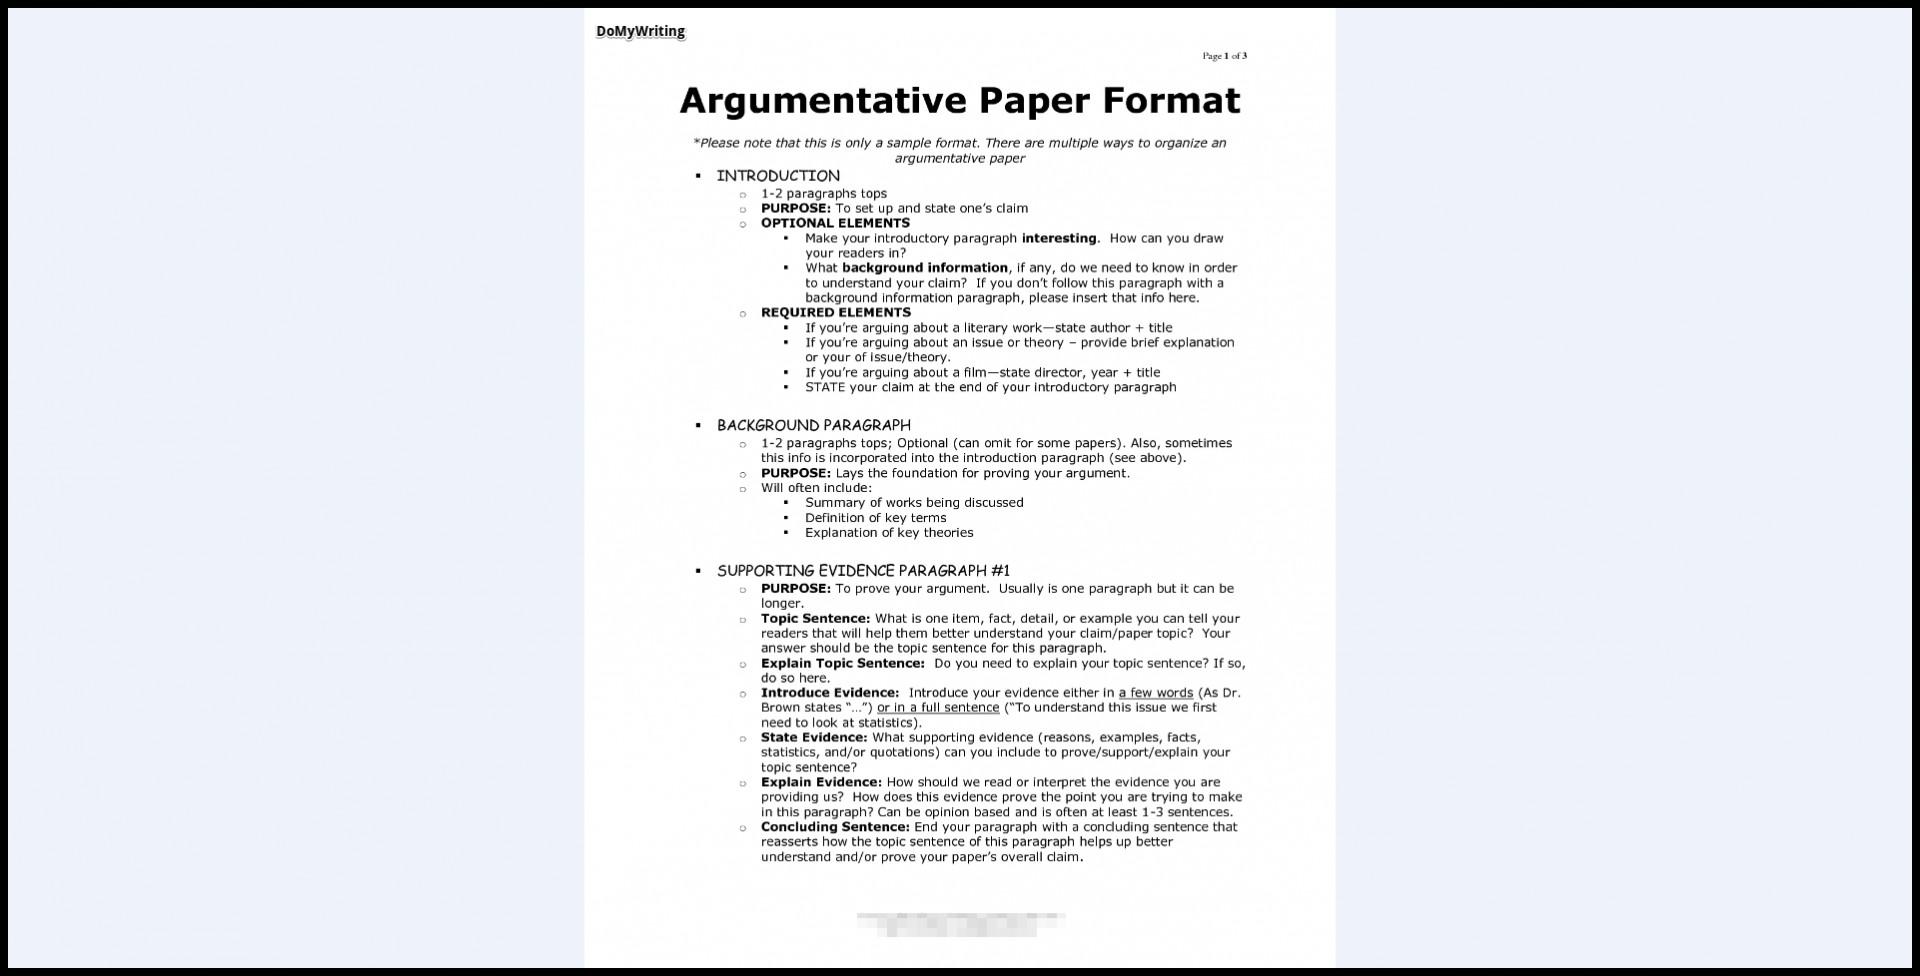 009 Essay Example Argumentative Format Controversial Excellent Topics Topic Ideas 2017 Music 1920